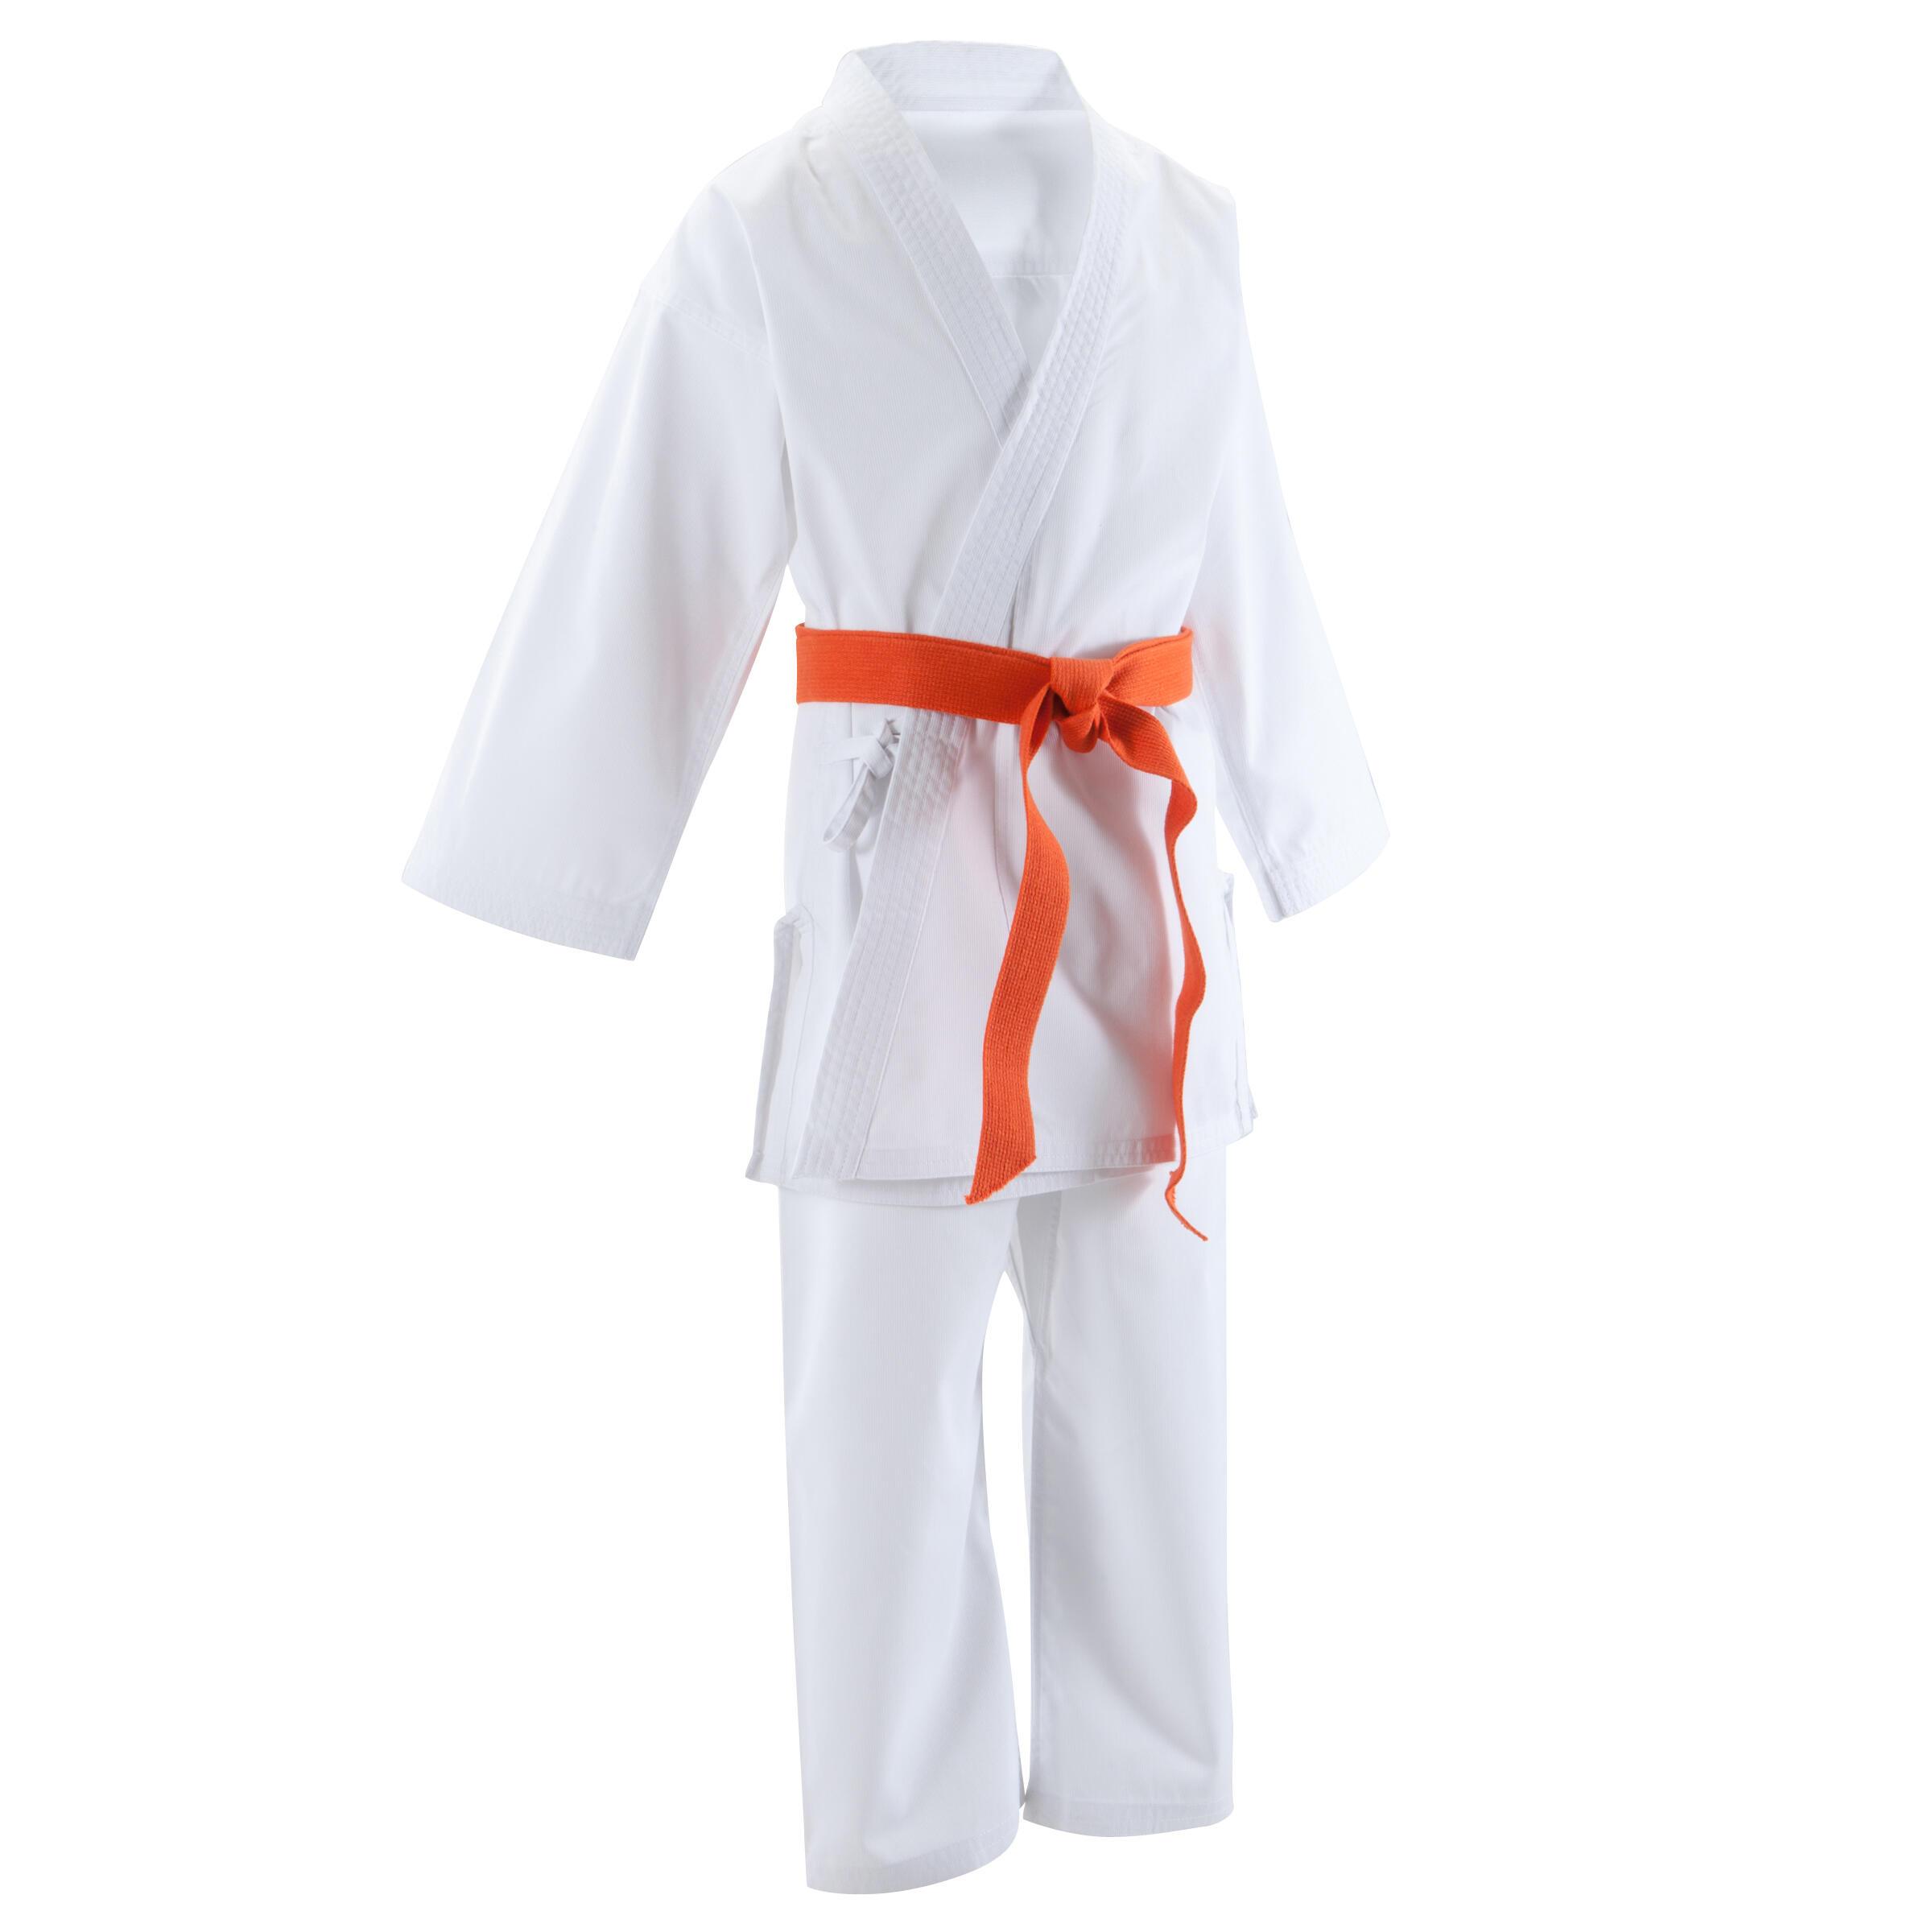 240 Kids' Karate Gi